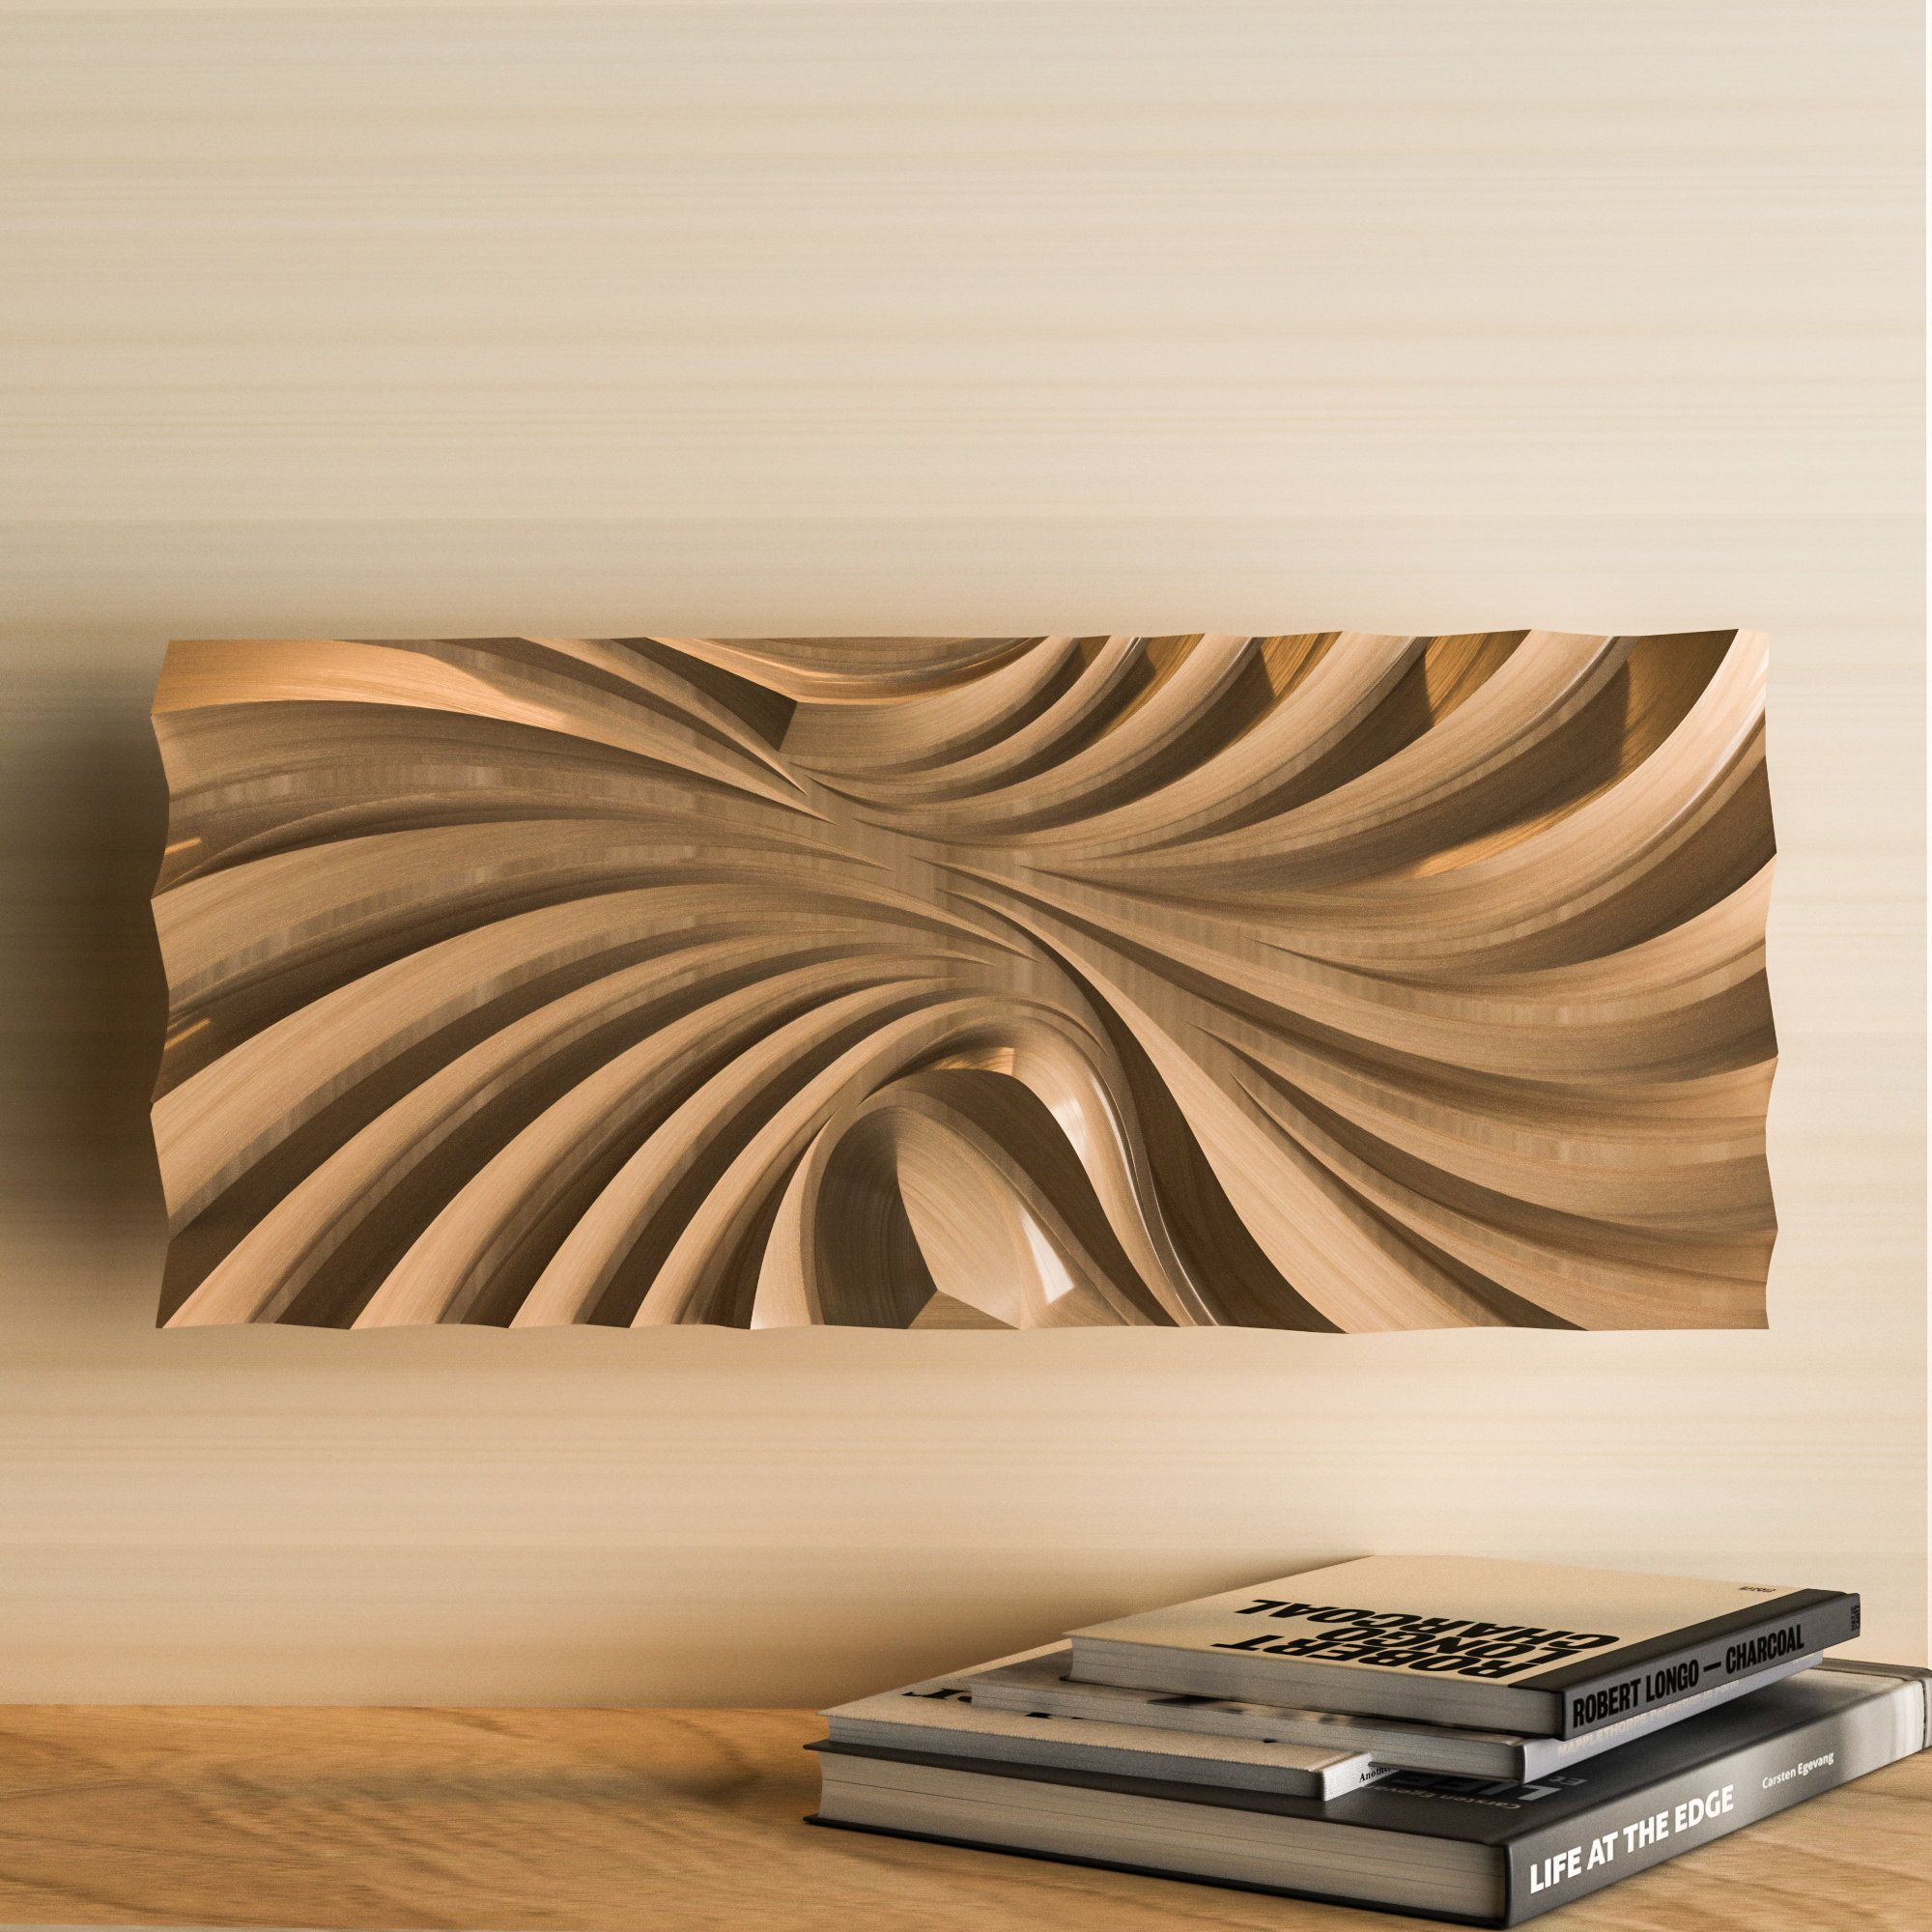 3d Model Of Wall Panels Cnc Panels Cnc Router File 3d Stl Model Snc Furniture Facade Stl Cnc Wave Sculpture Snc Files For Wood In 2021 Wall Panels Cnc Wood Carving